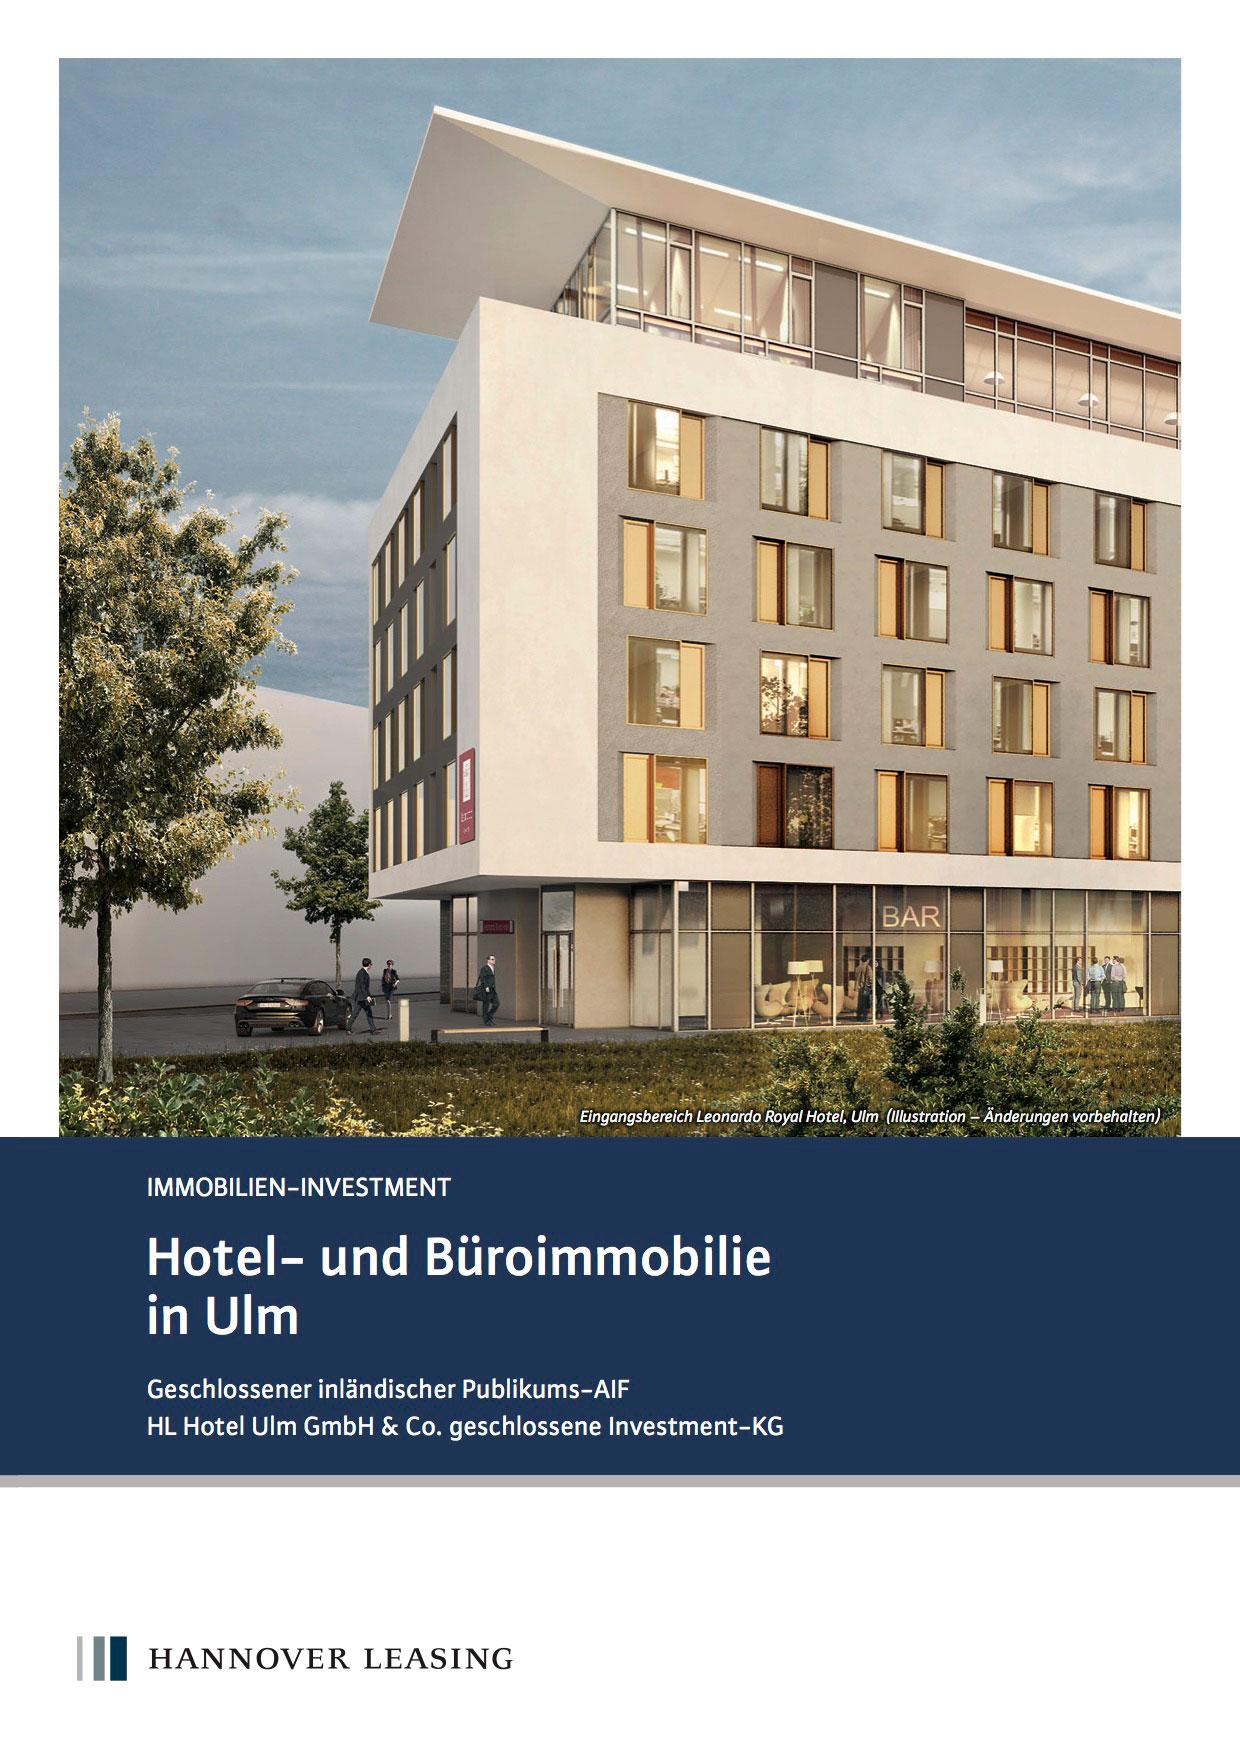 ``Hannover Leasing Hotel- und Büroimmobilie Ulm``